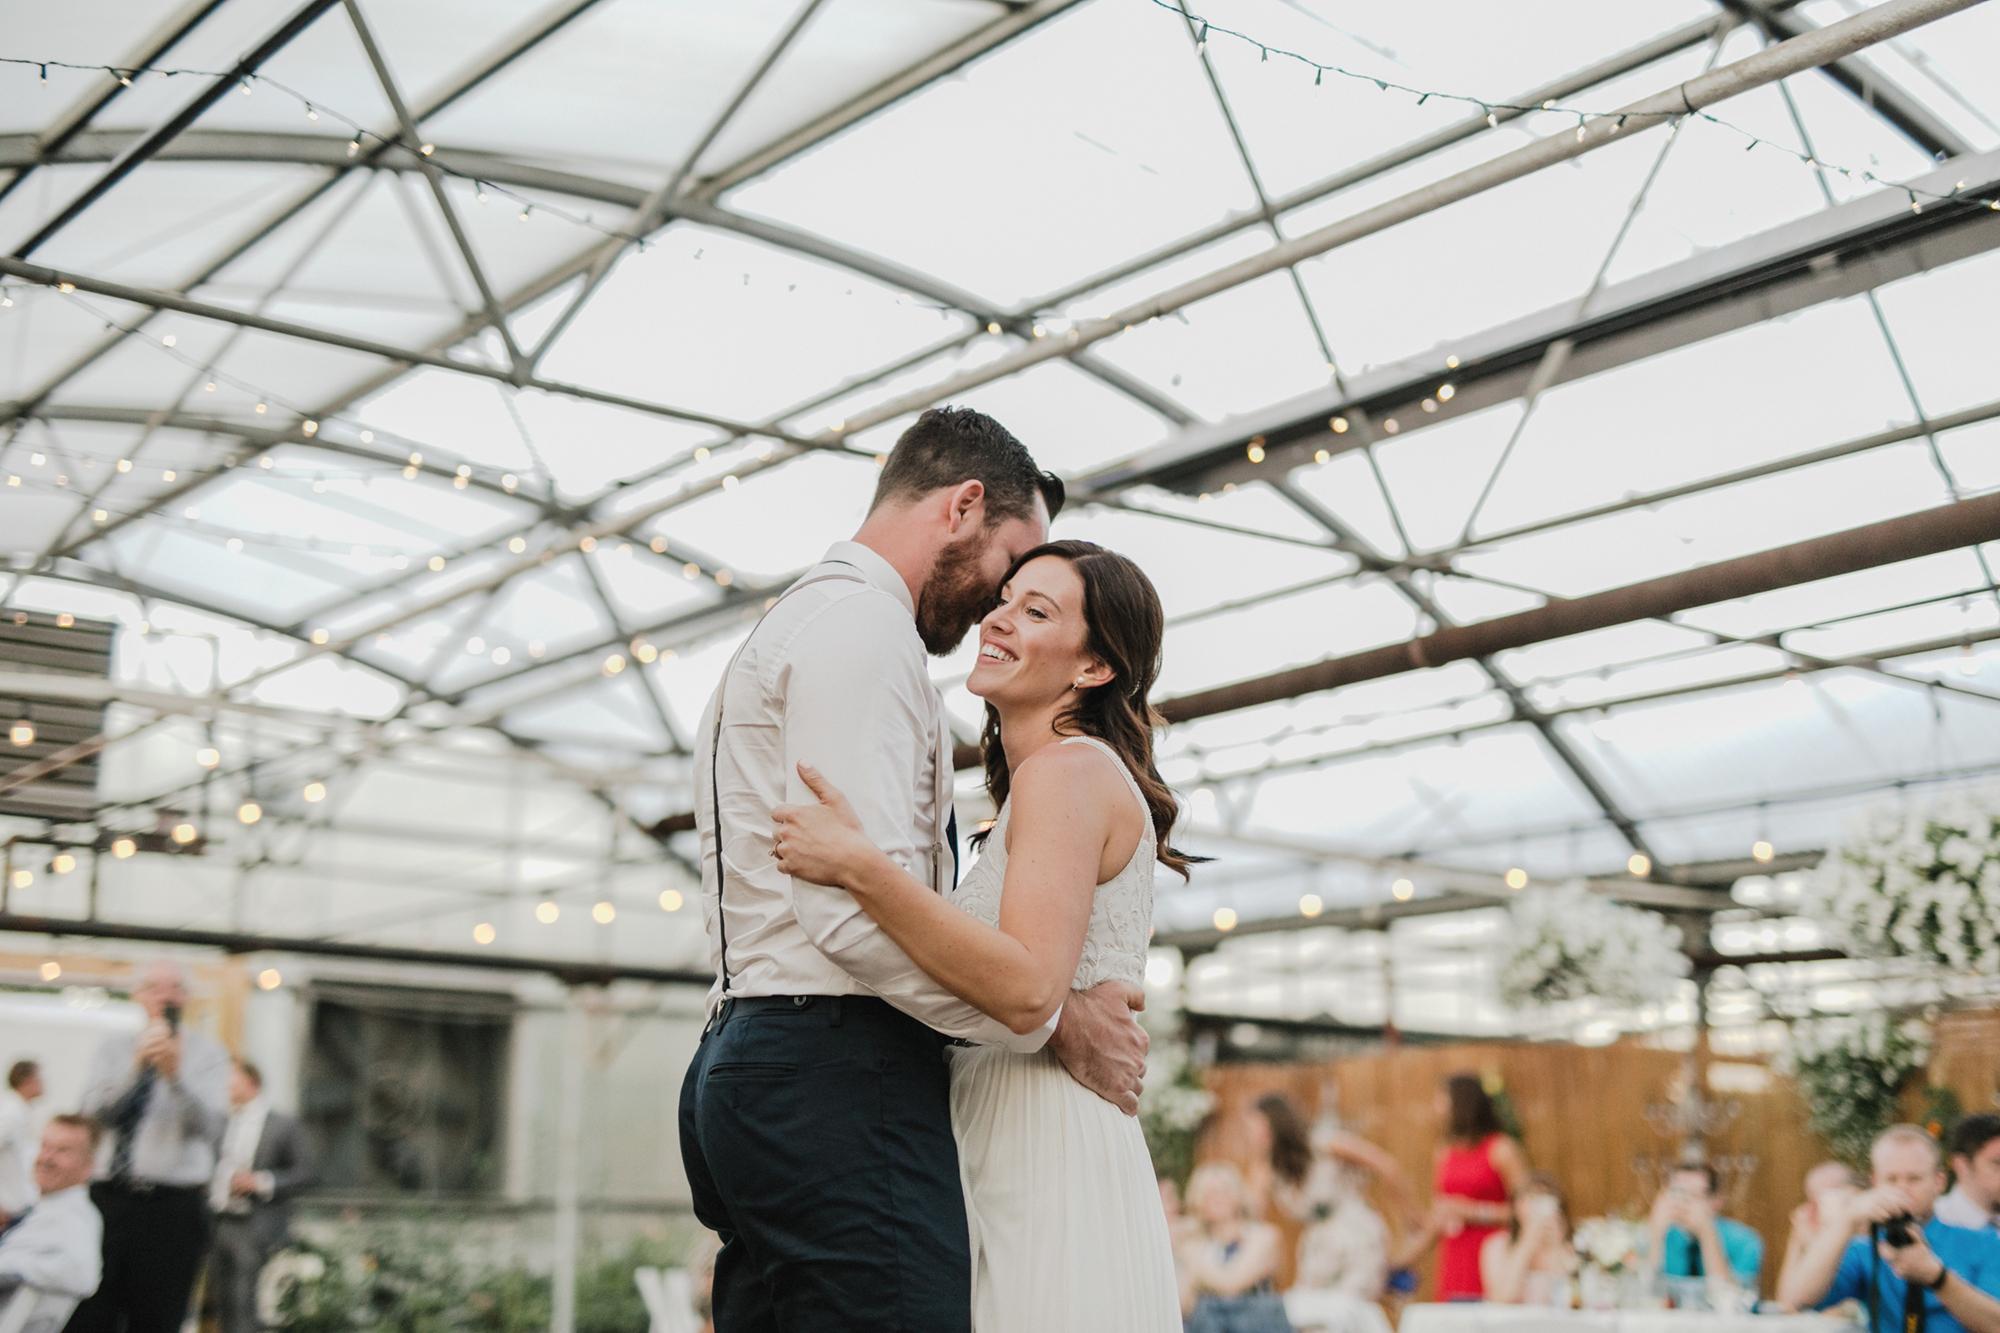 Flower Farm Crowsnest Pass Wedding -093.JPG